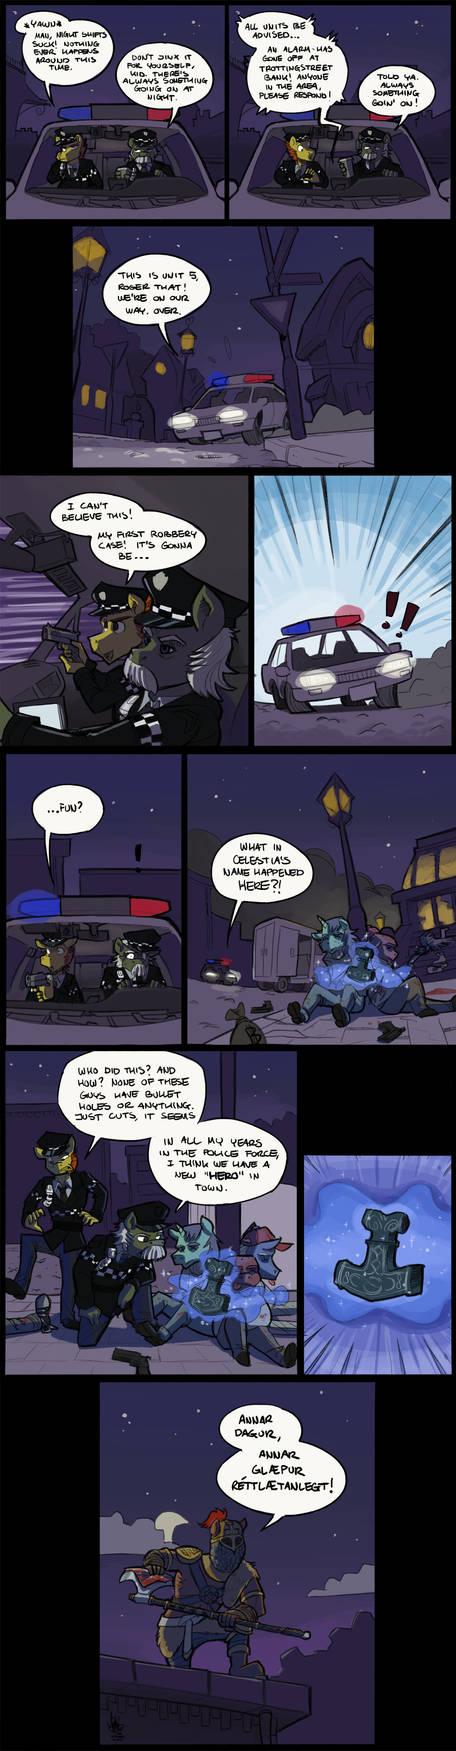 [Commission] Logrekkr by TheArtrix